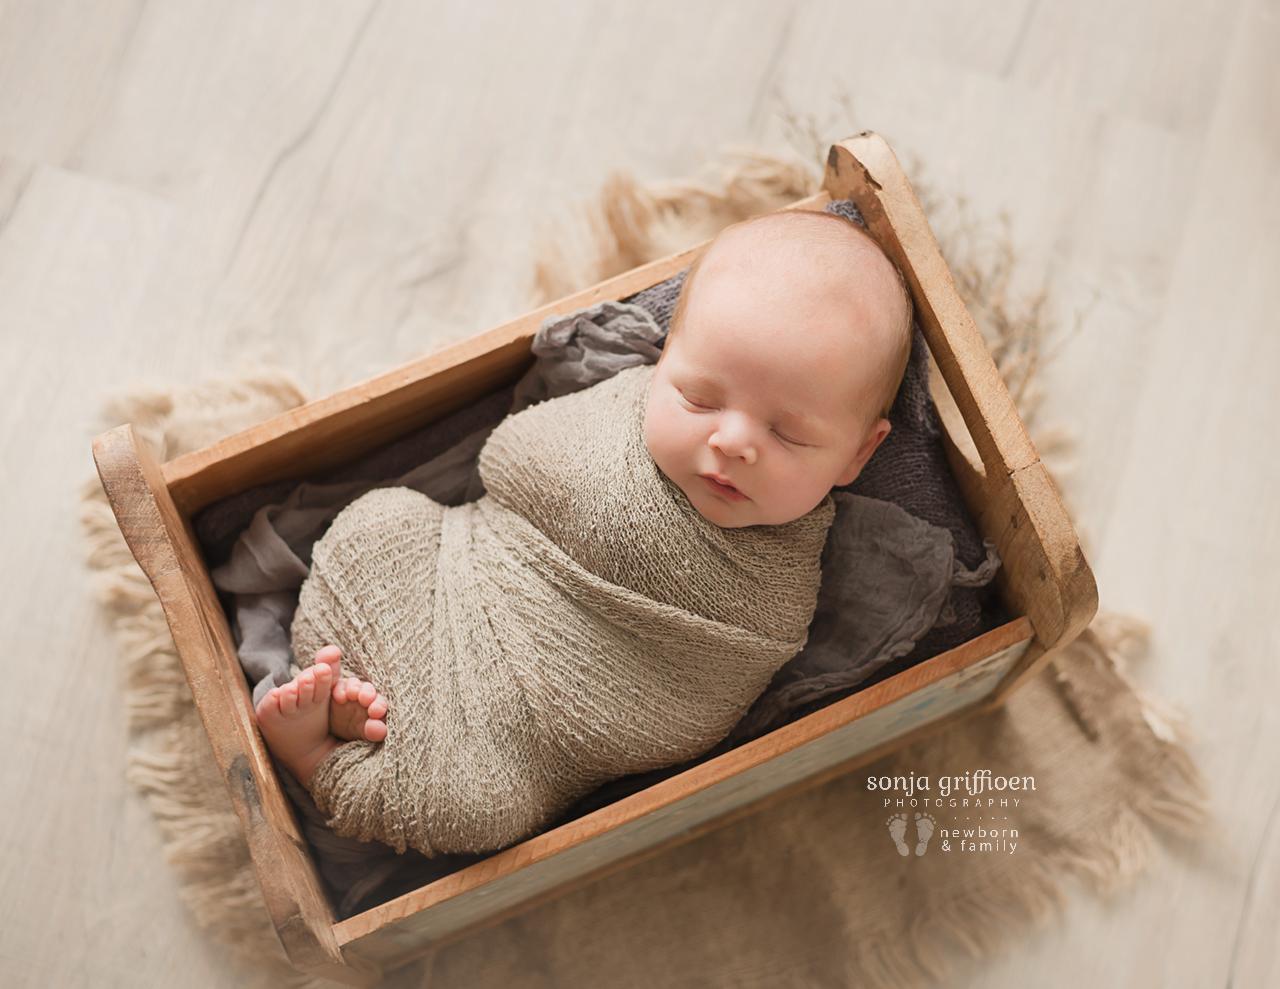 Lincoln-Newborn-Brisbane-Newborn-Photographer-Sonja-Griffioen-03.jpg